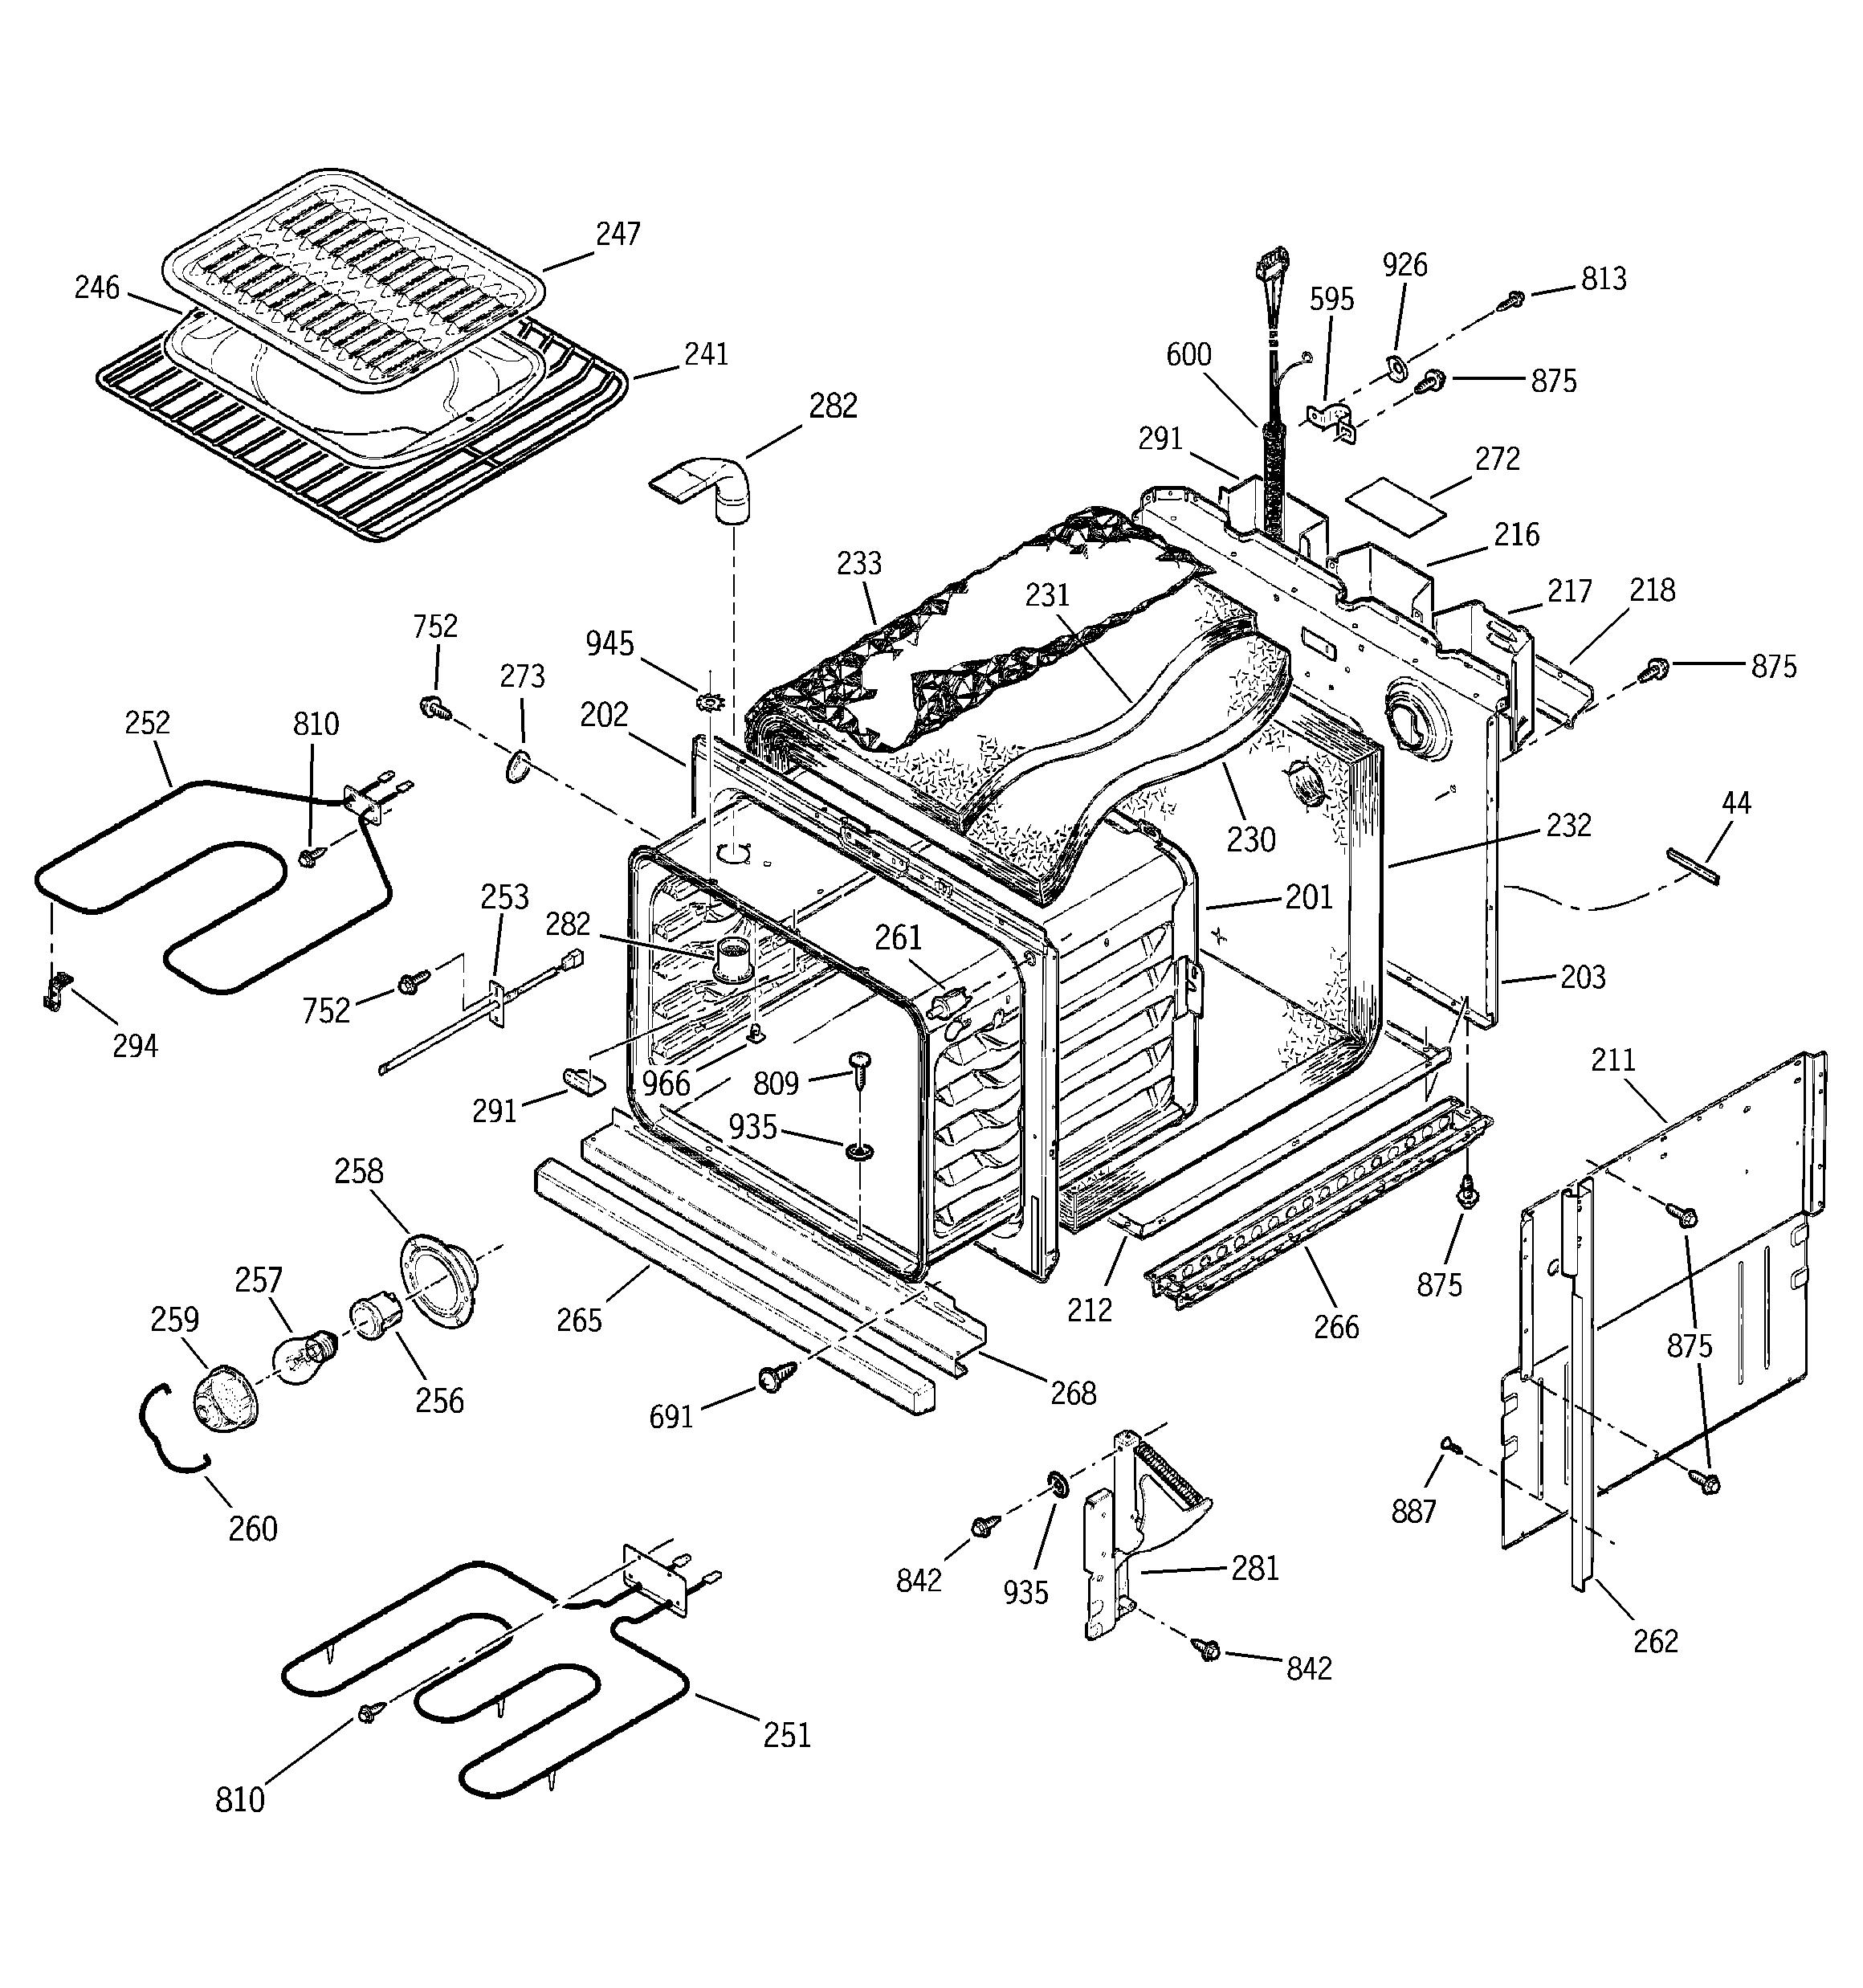 Amazing ge range parts diagram ge range parts diagram 2320 x 2475 · 103 kb ·